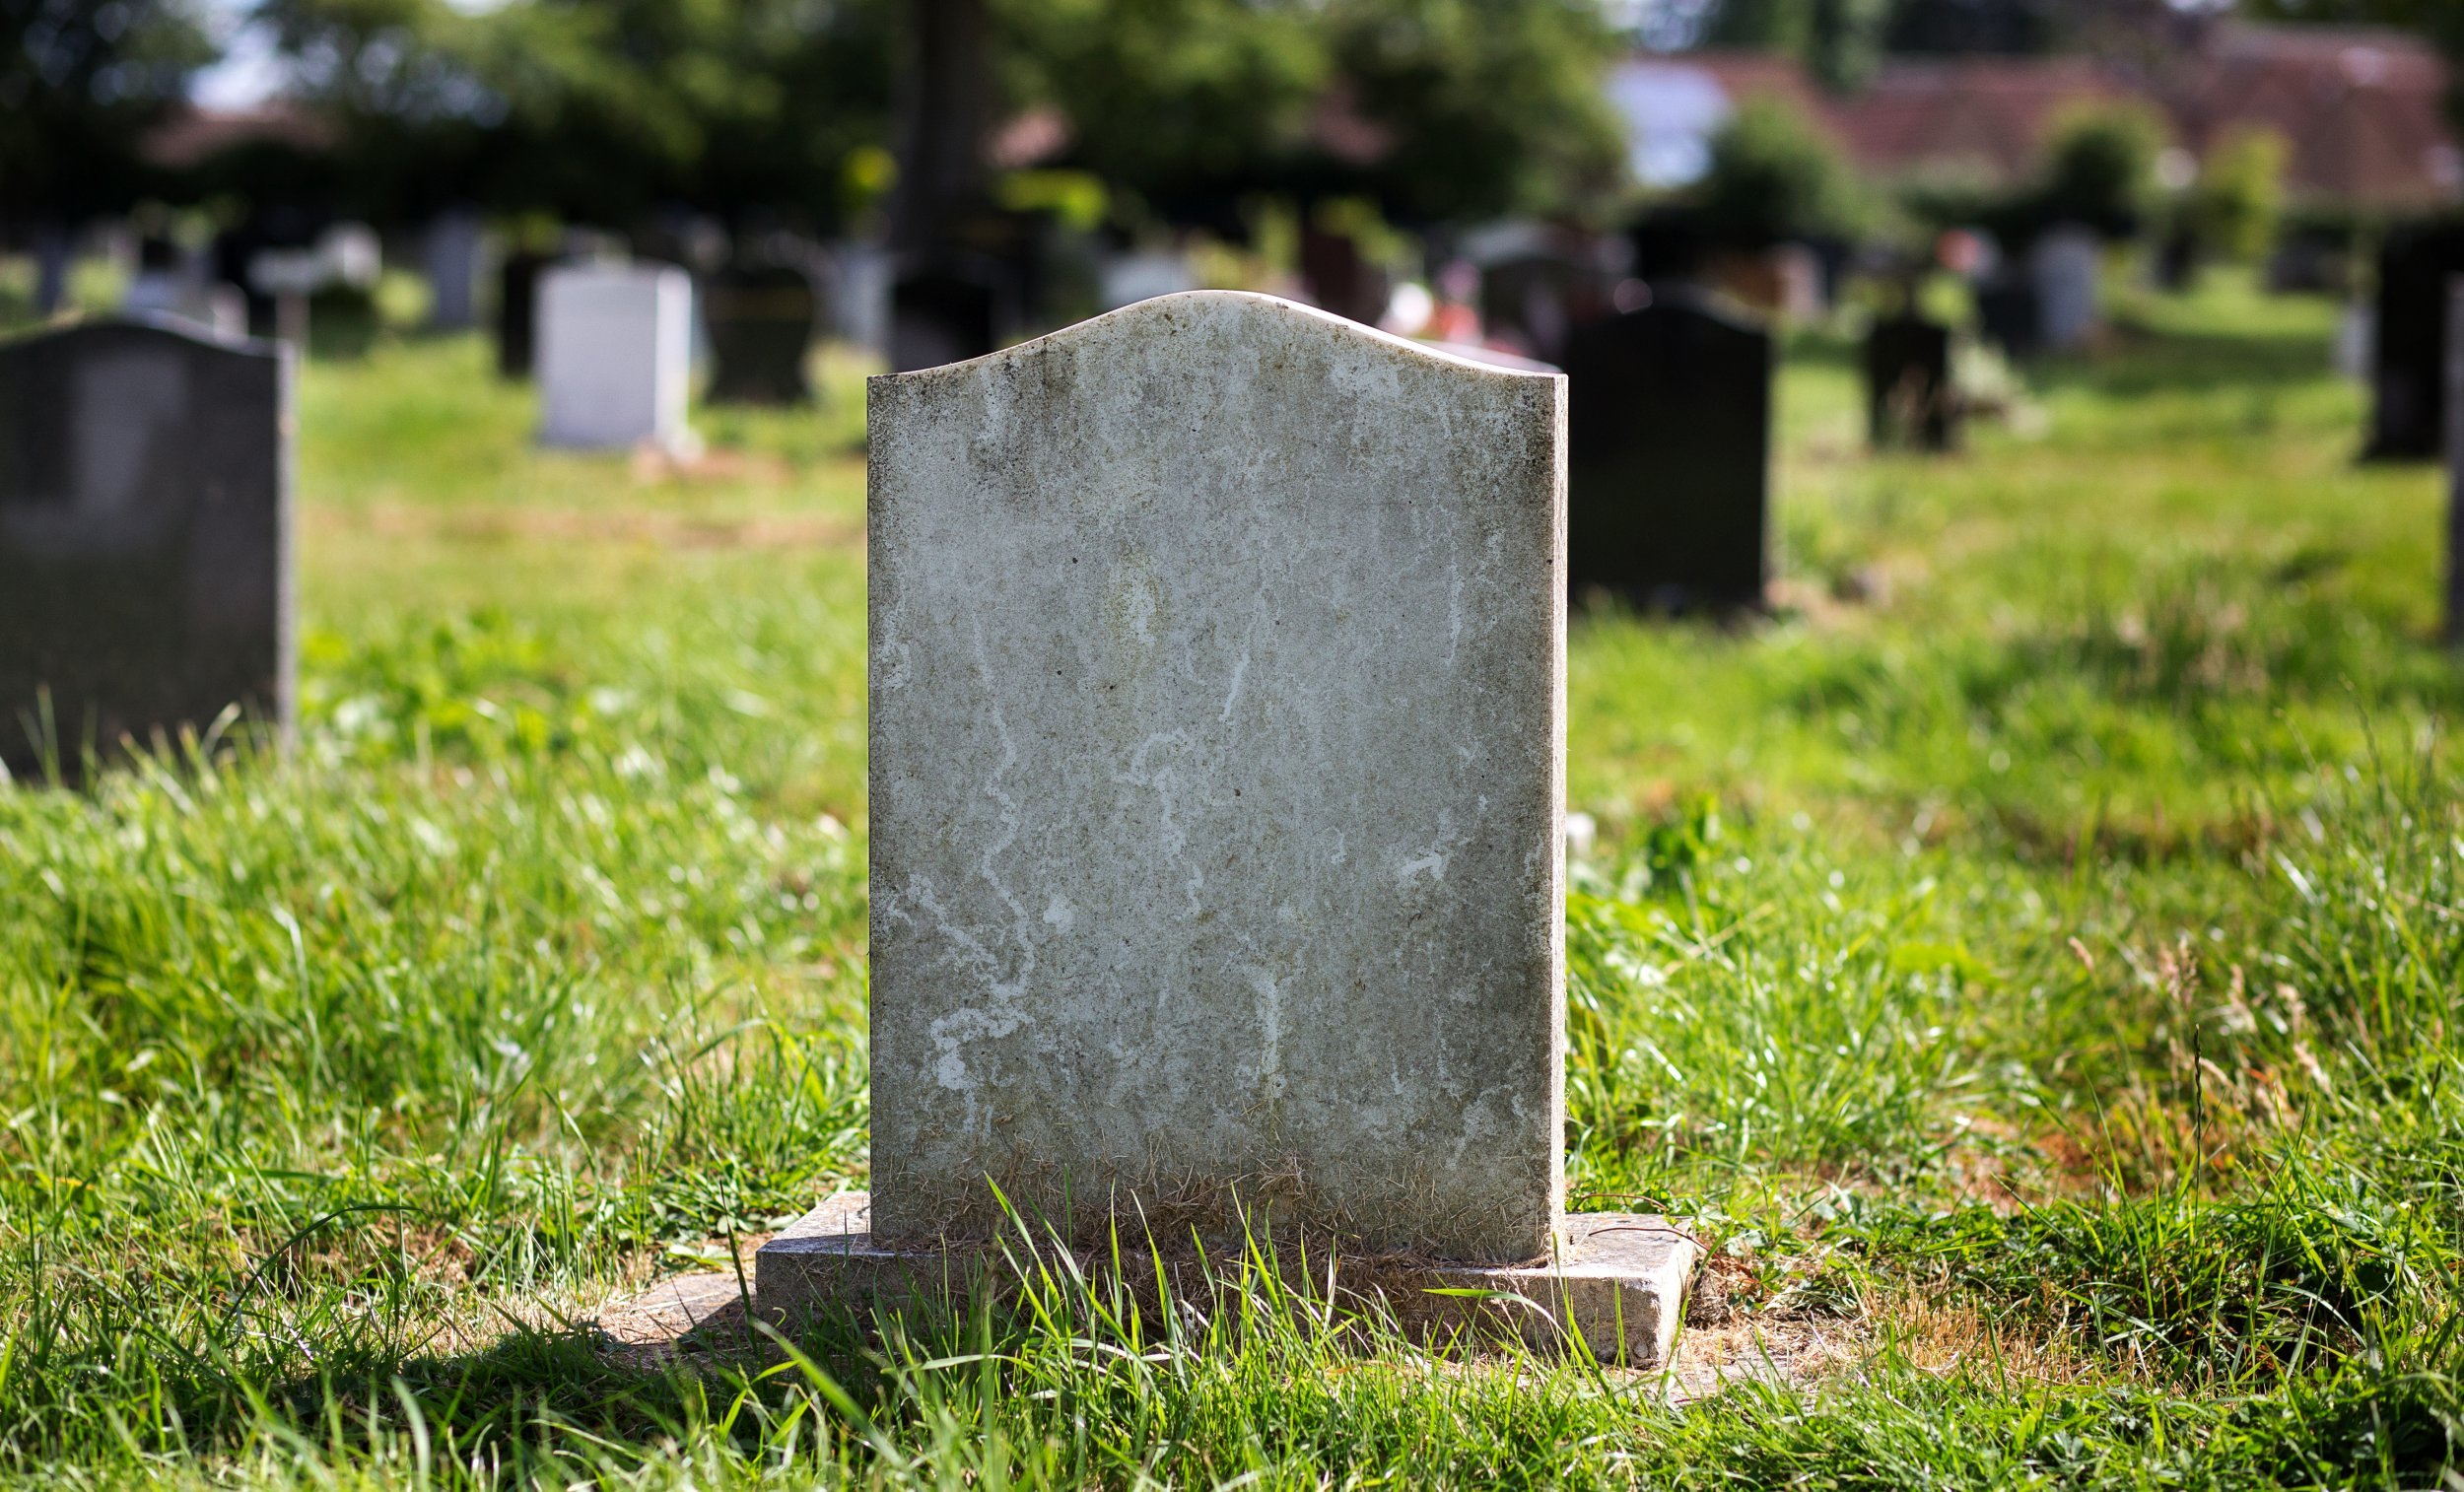 Human Composting, Death